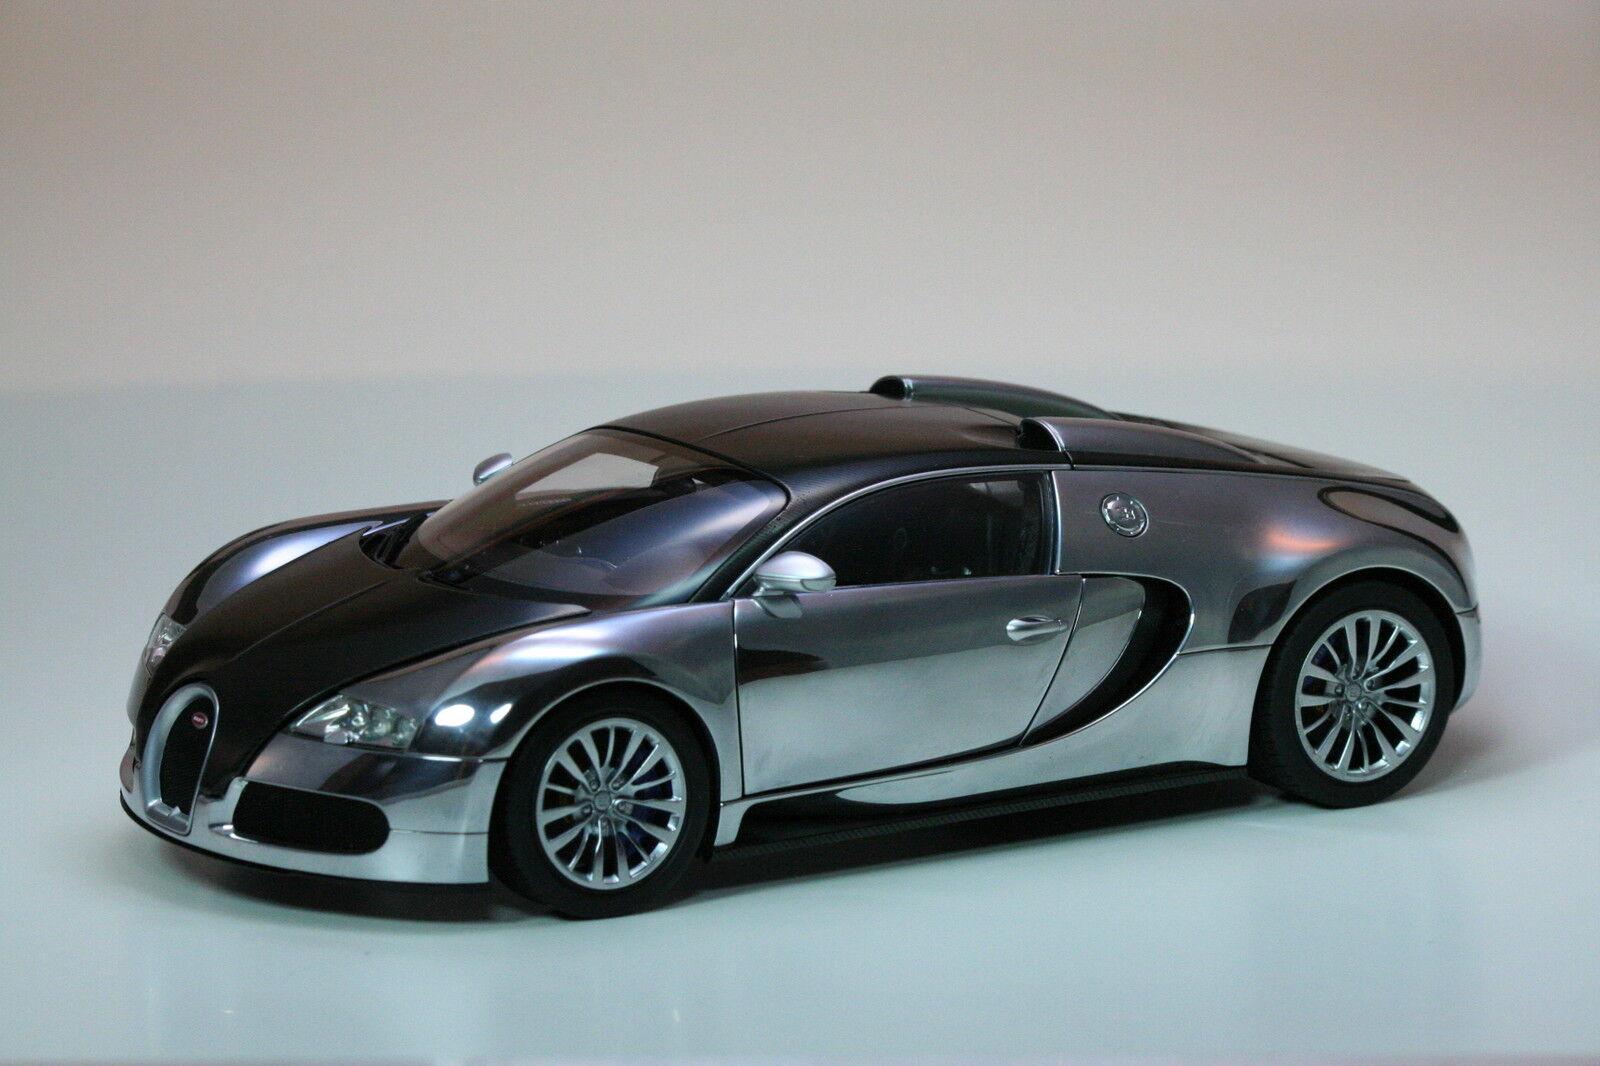 AutoArt Bugatti Veyron 16.4 Pur Sang Noir Aluminium 70966 Ltd. 1 18 Nouveau neuf dans sa boîte